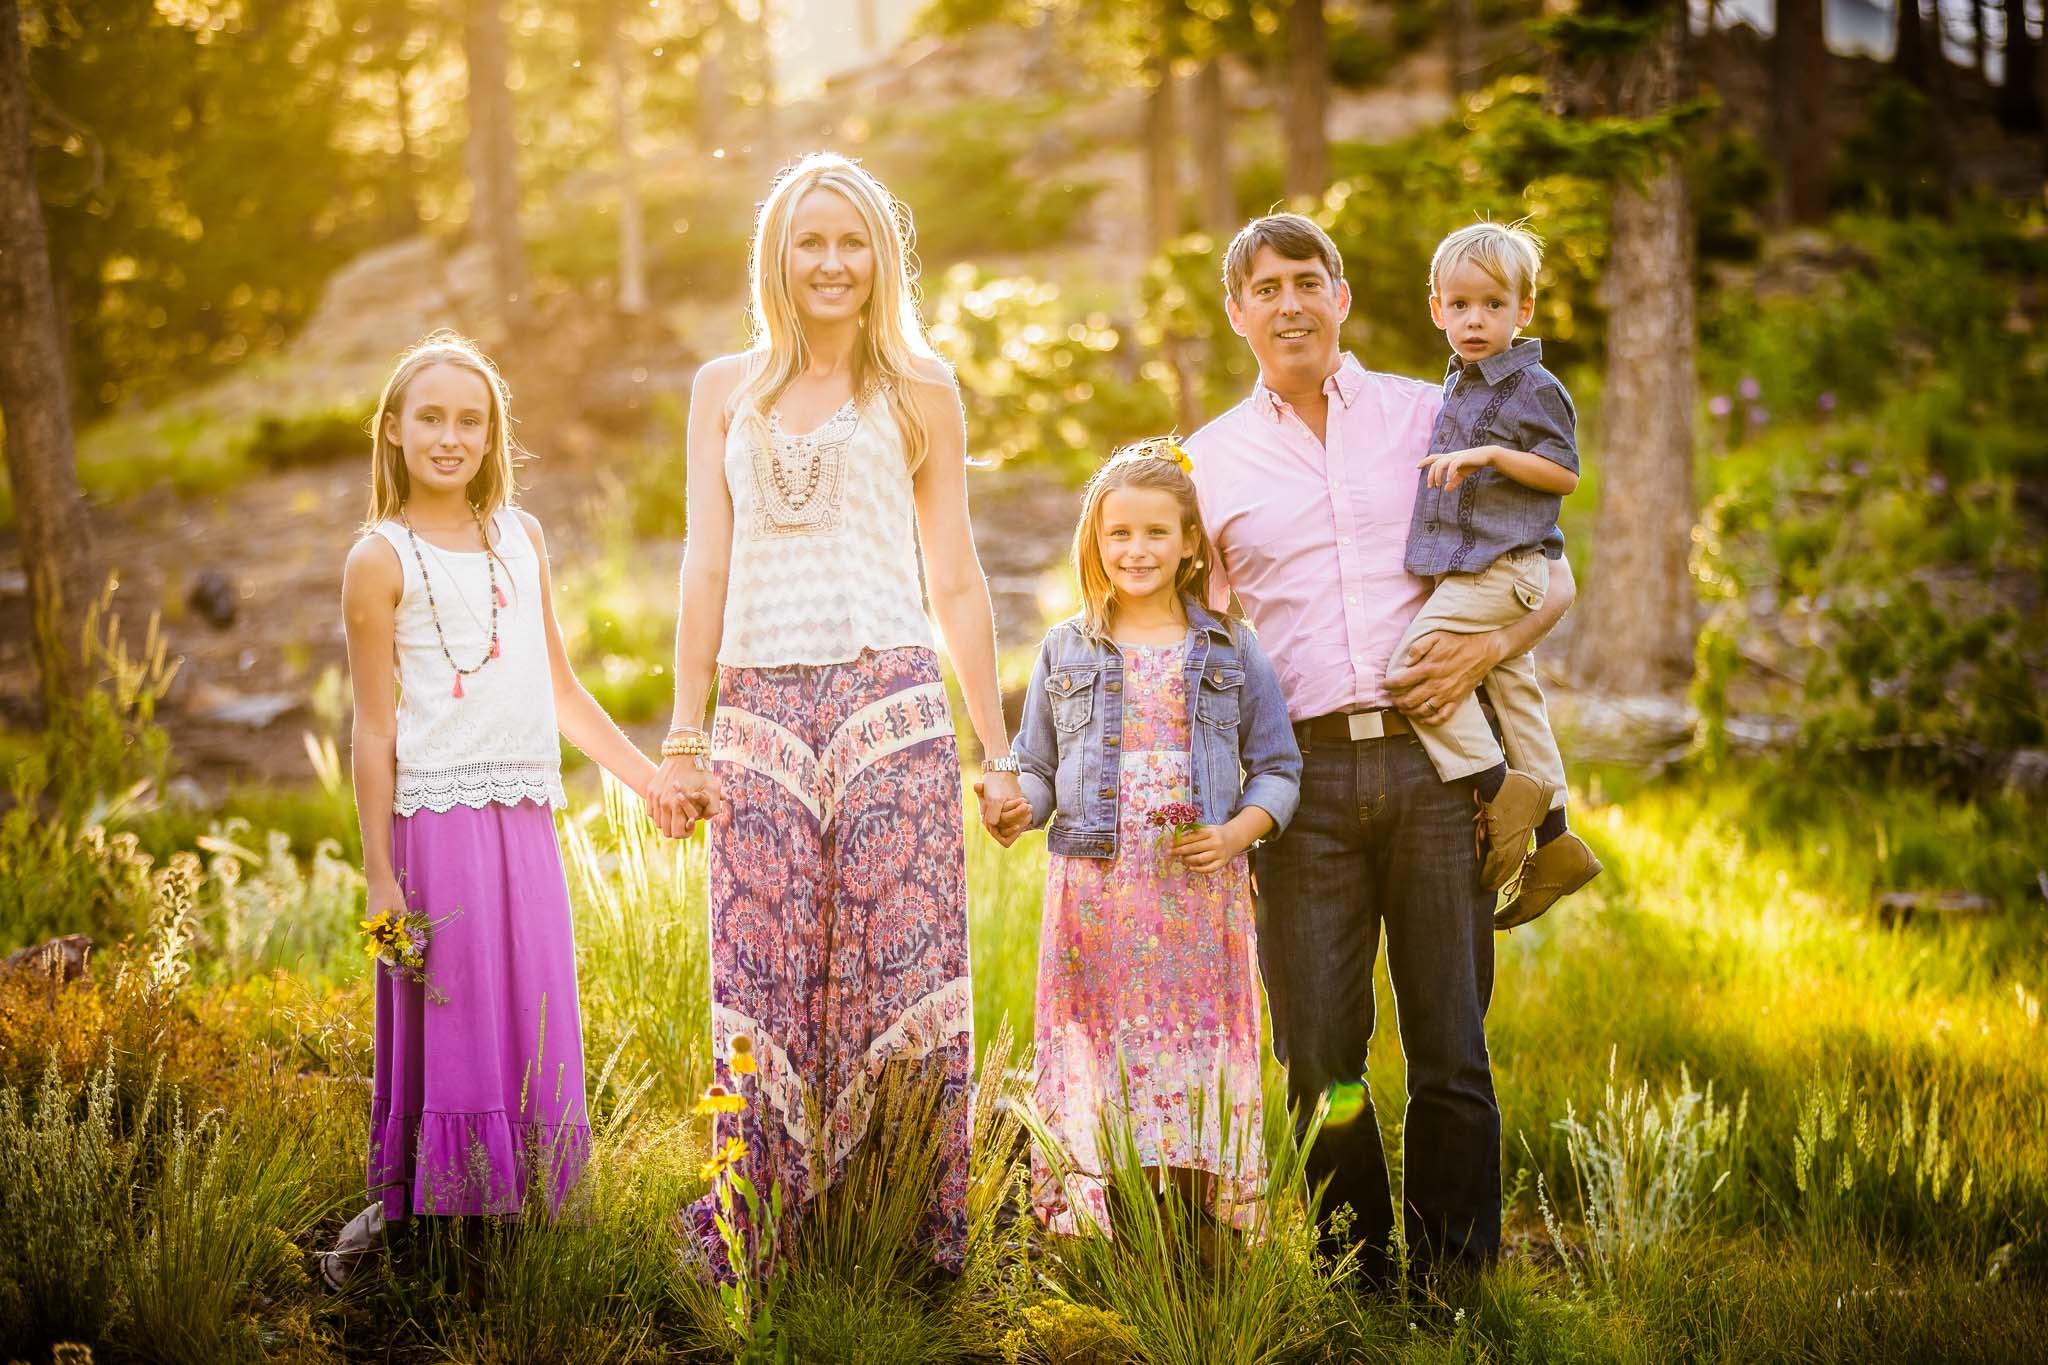 Family photography at Lily Lake near Estes Park, CO